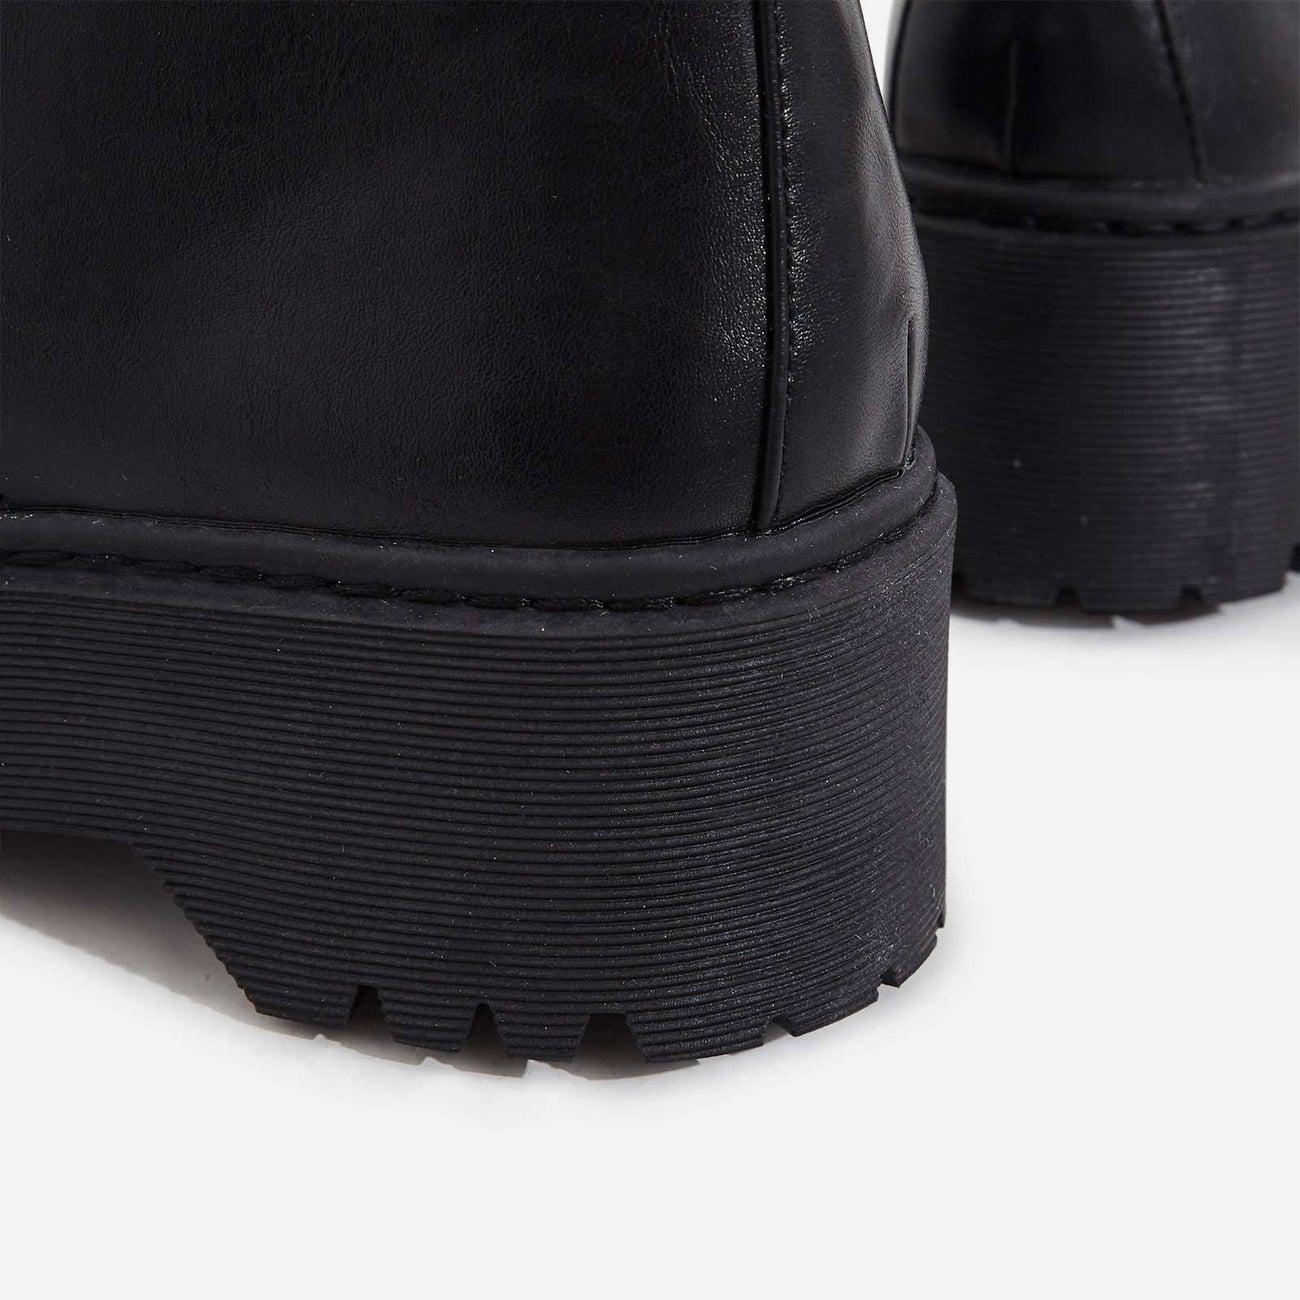 LuxeModa CARGO Black Vegan Chunky Platform Lace-Up Combat Boot Pocket Pouch